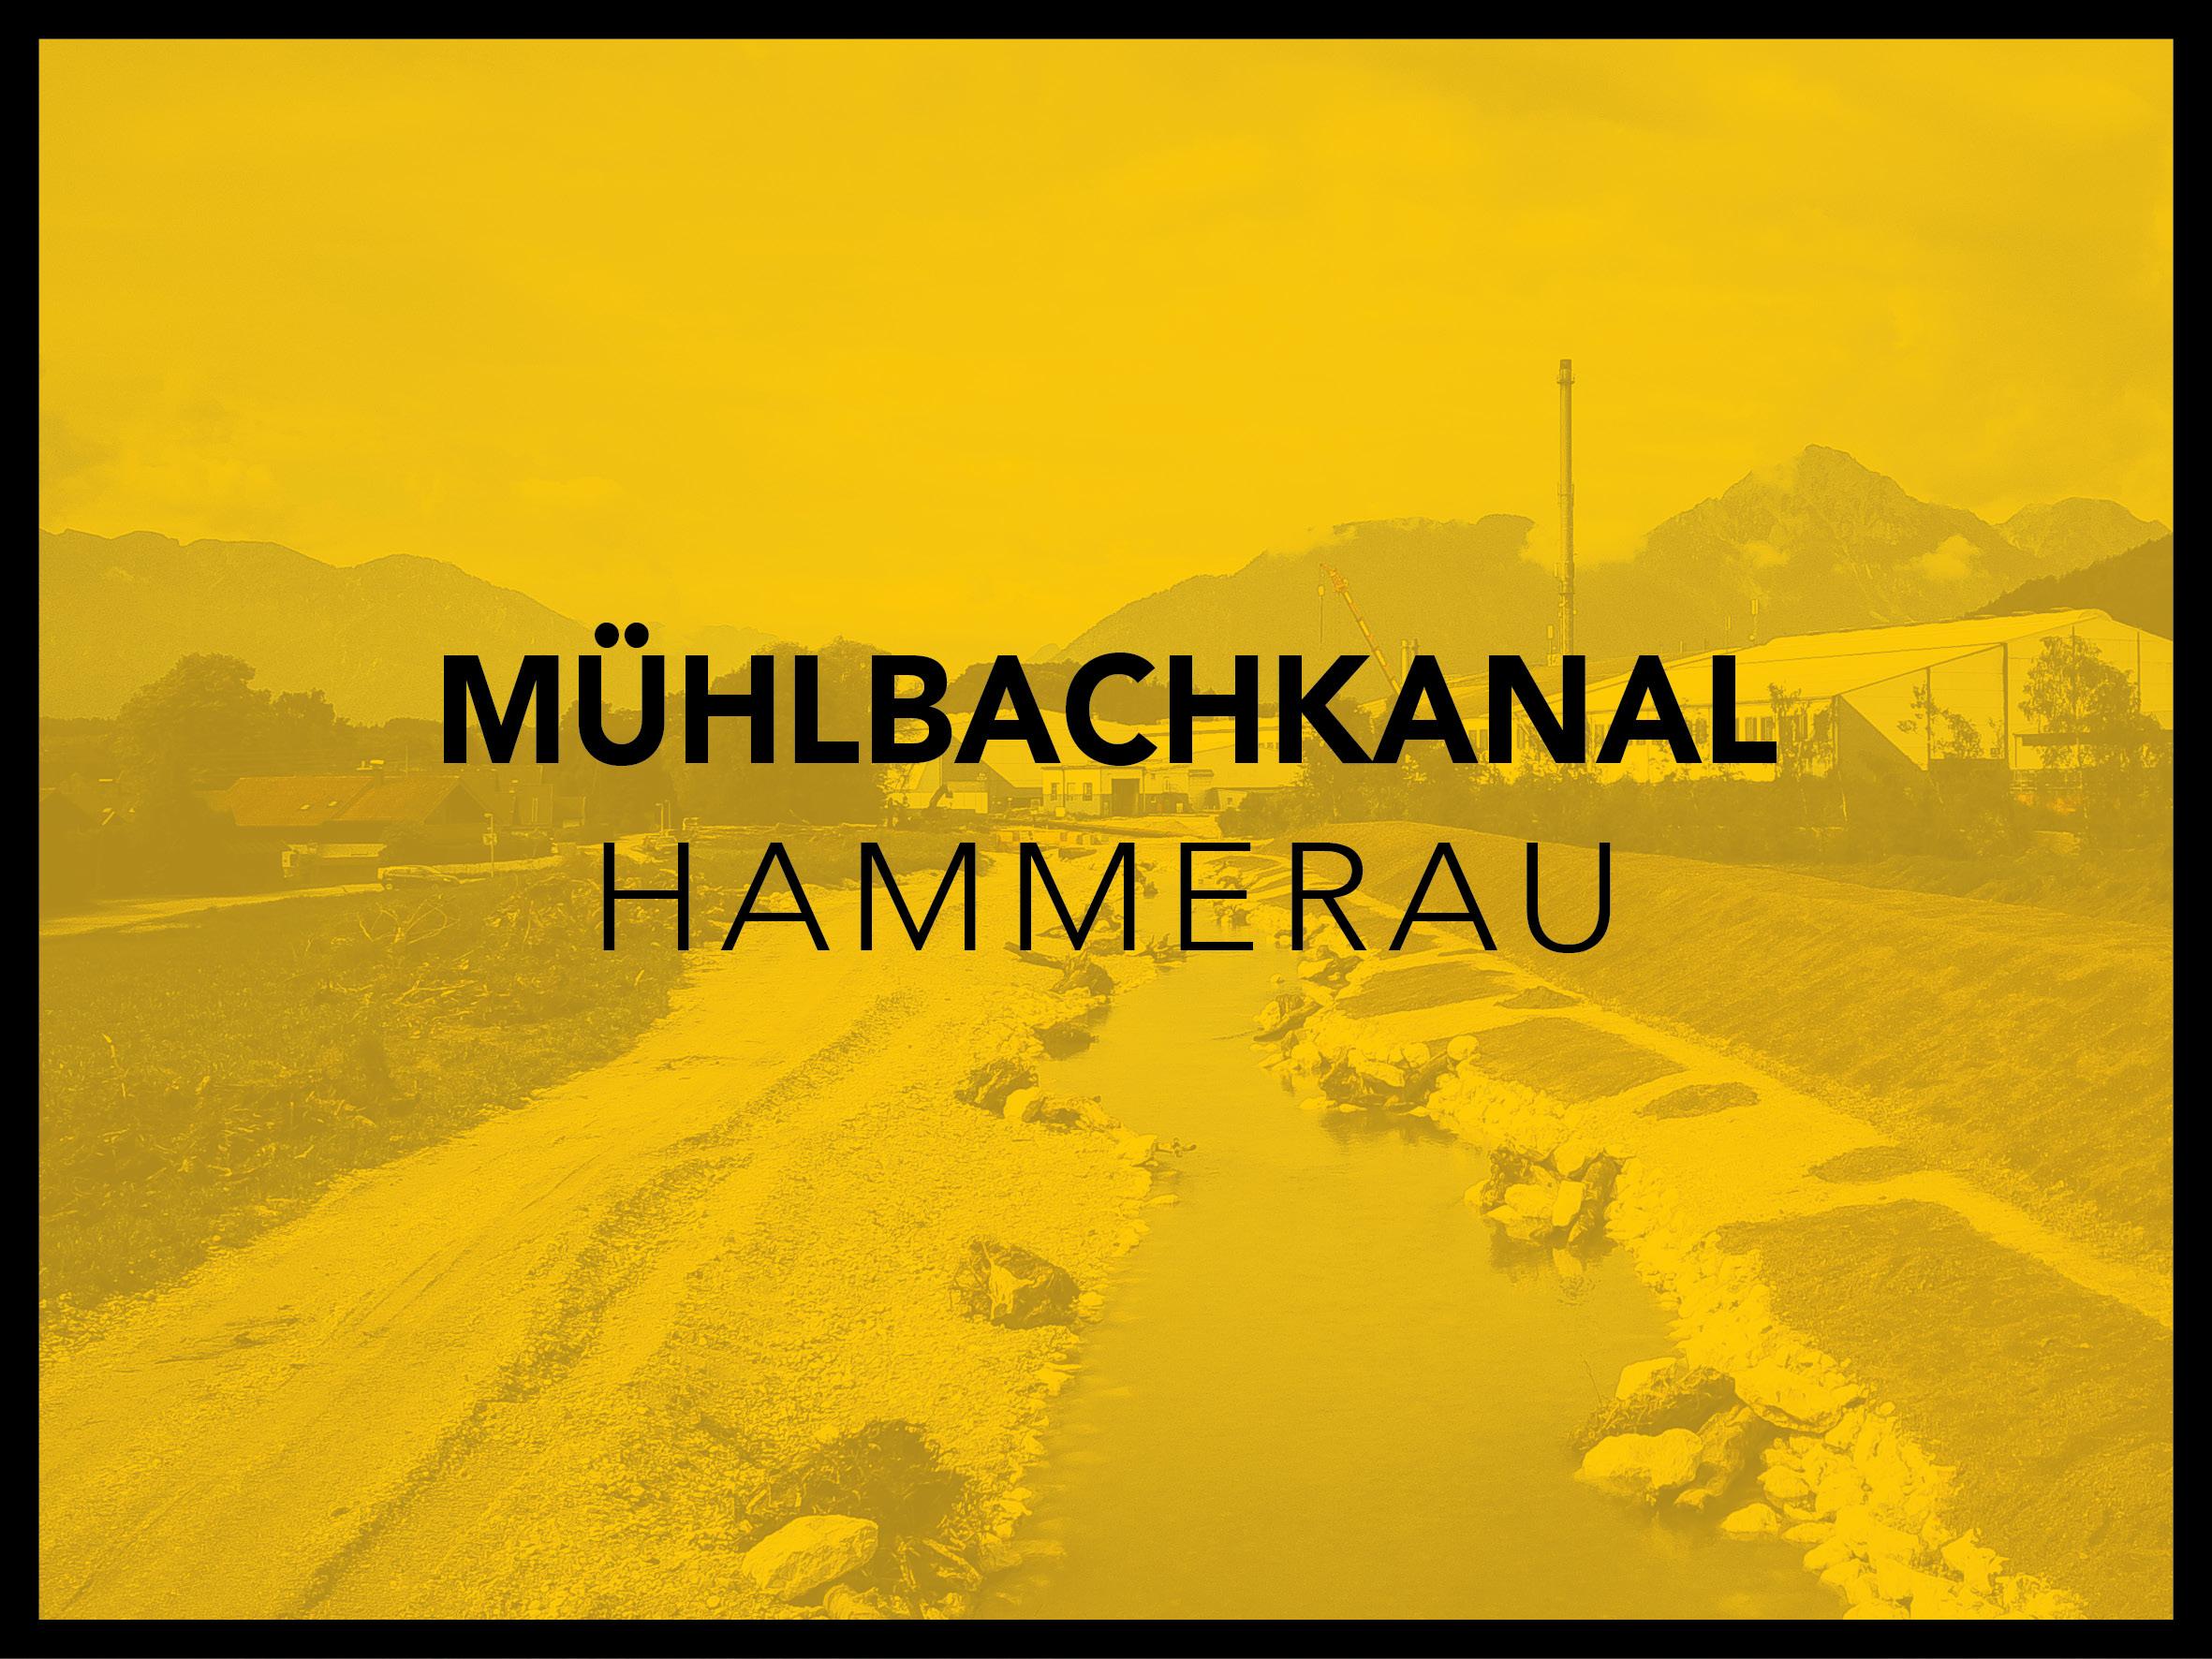 Mühlbachkanal